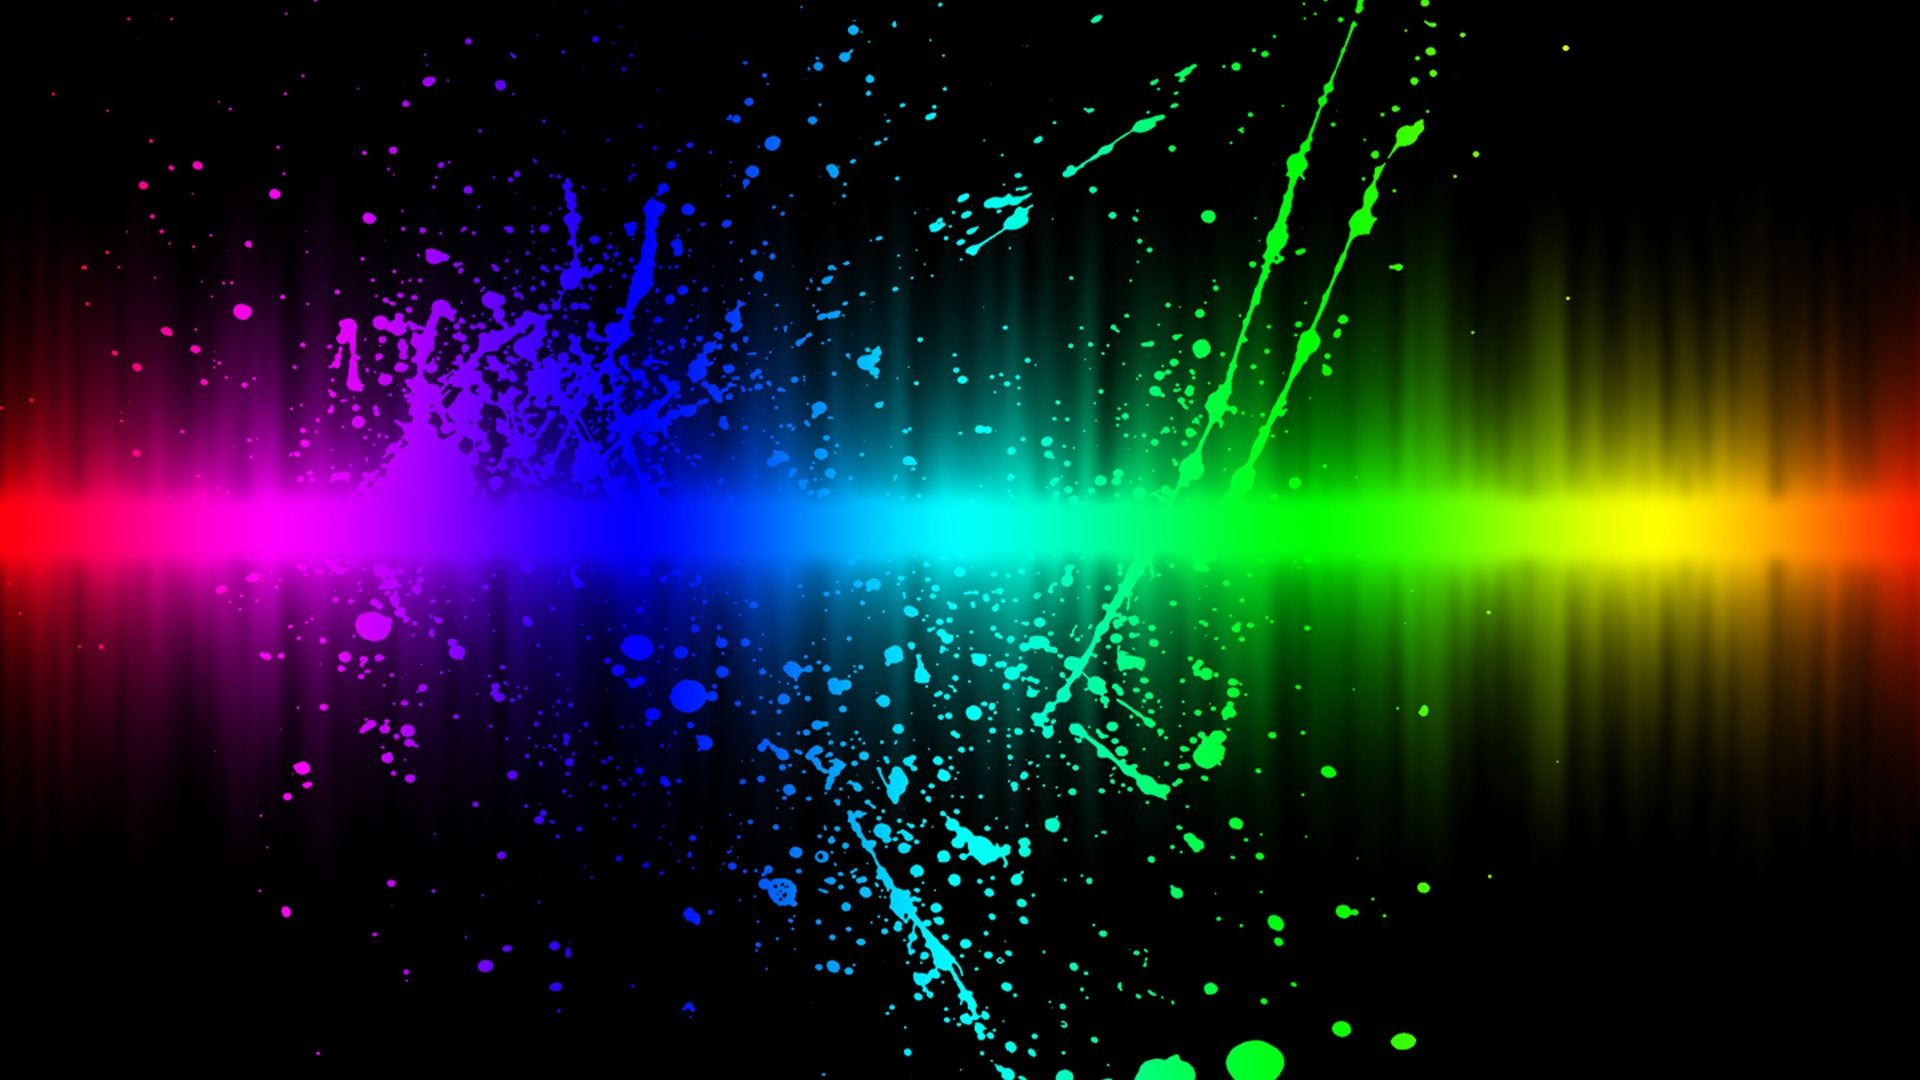 Neon Lights HD Wallpaper